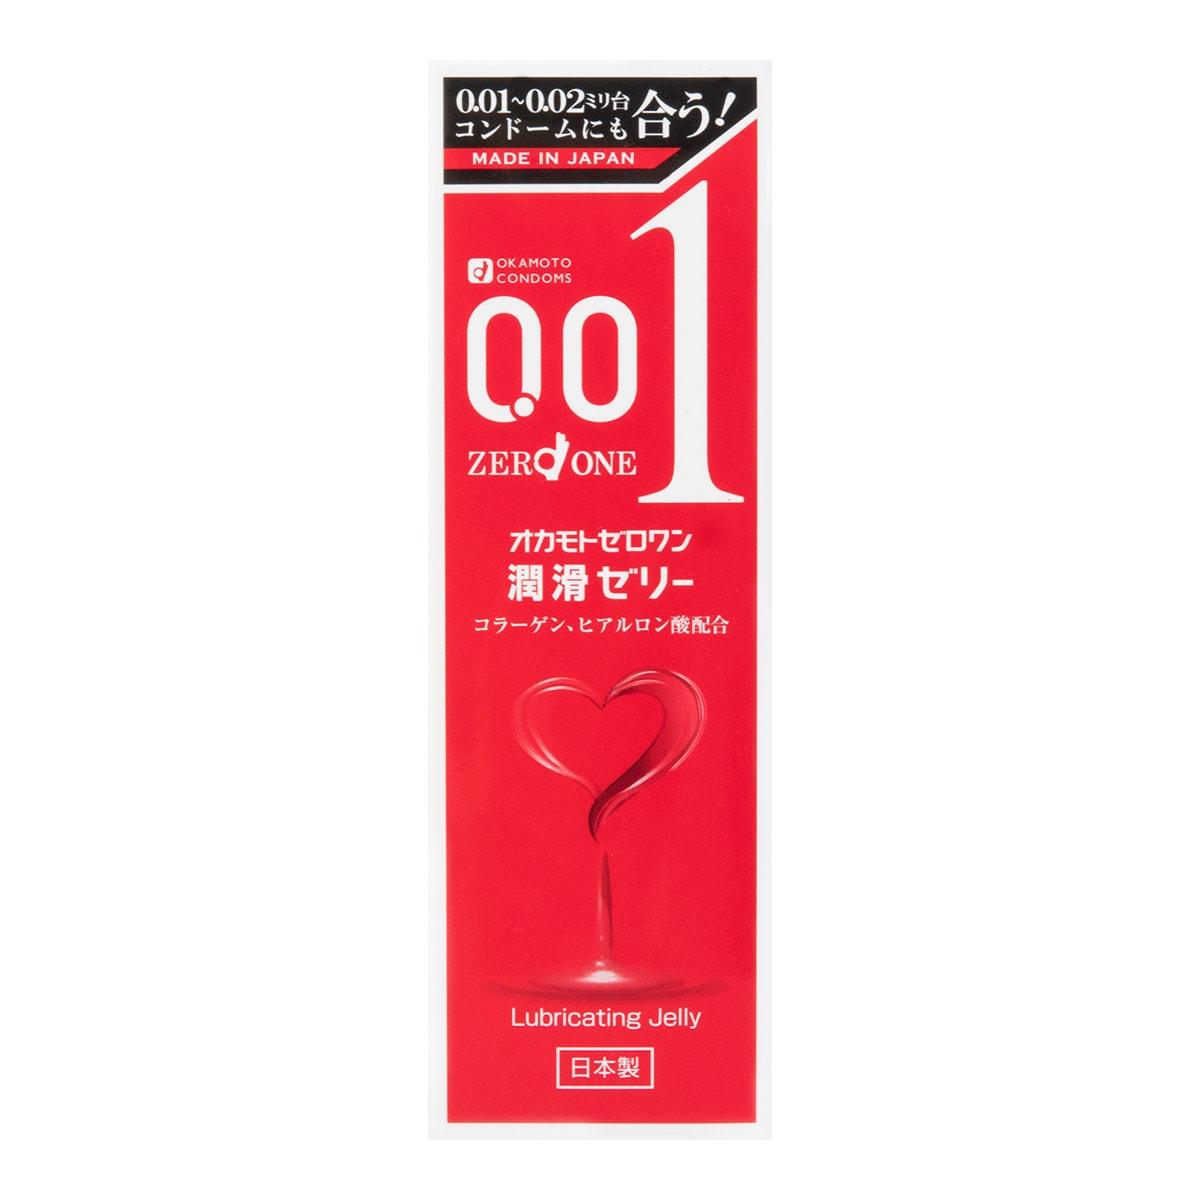 Adult toy OKAMOTO 001 Lubricating Jelly 50g